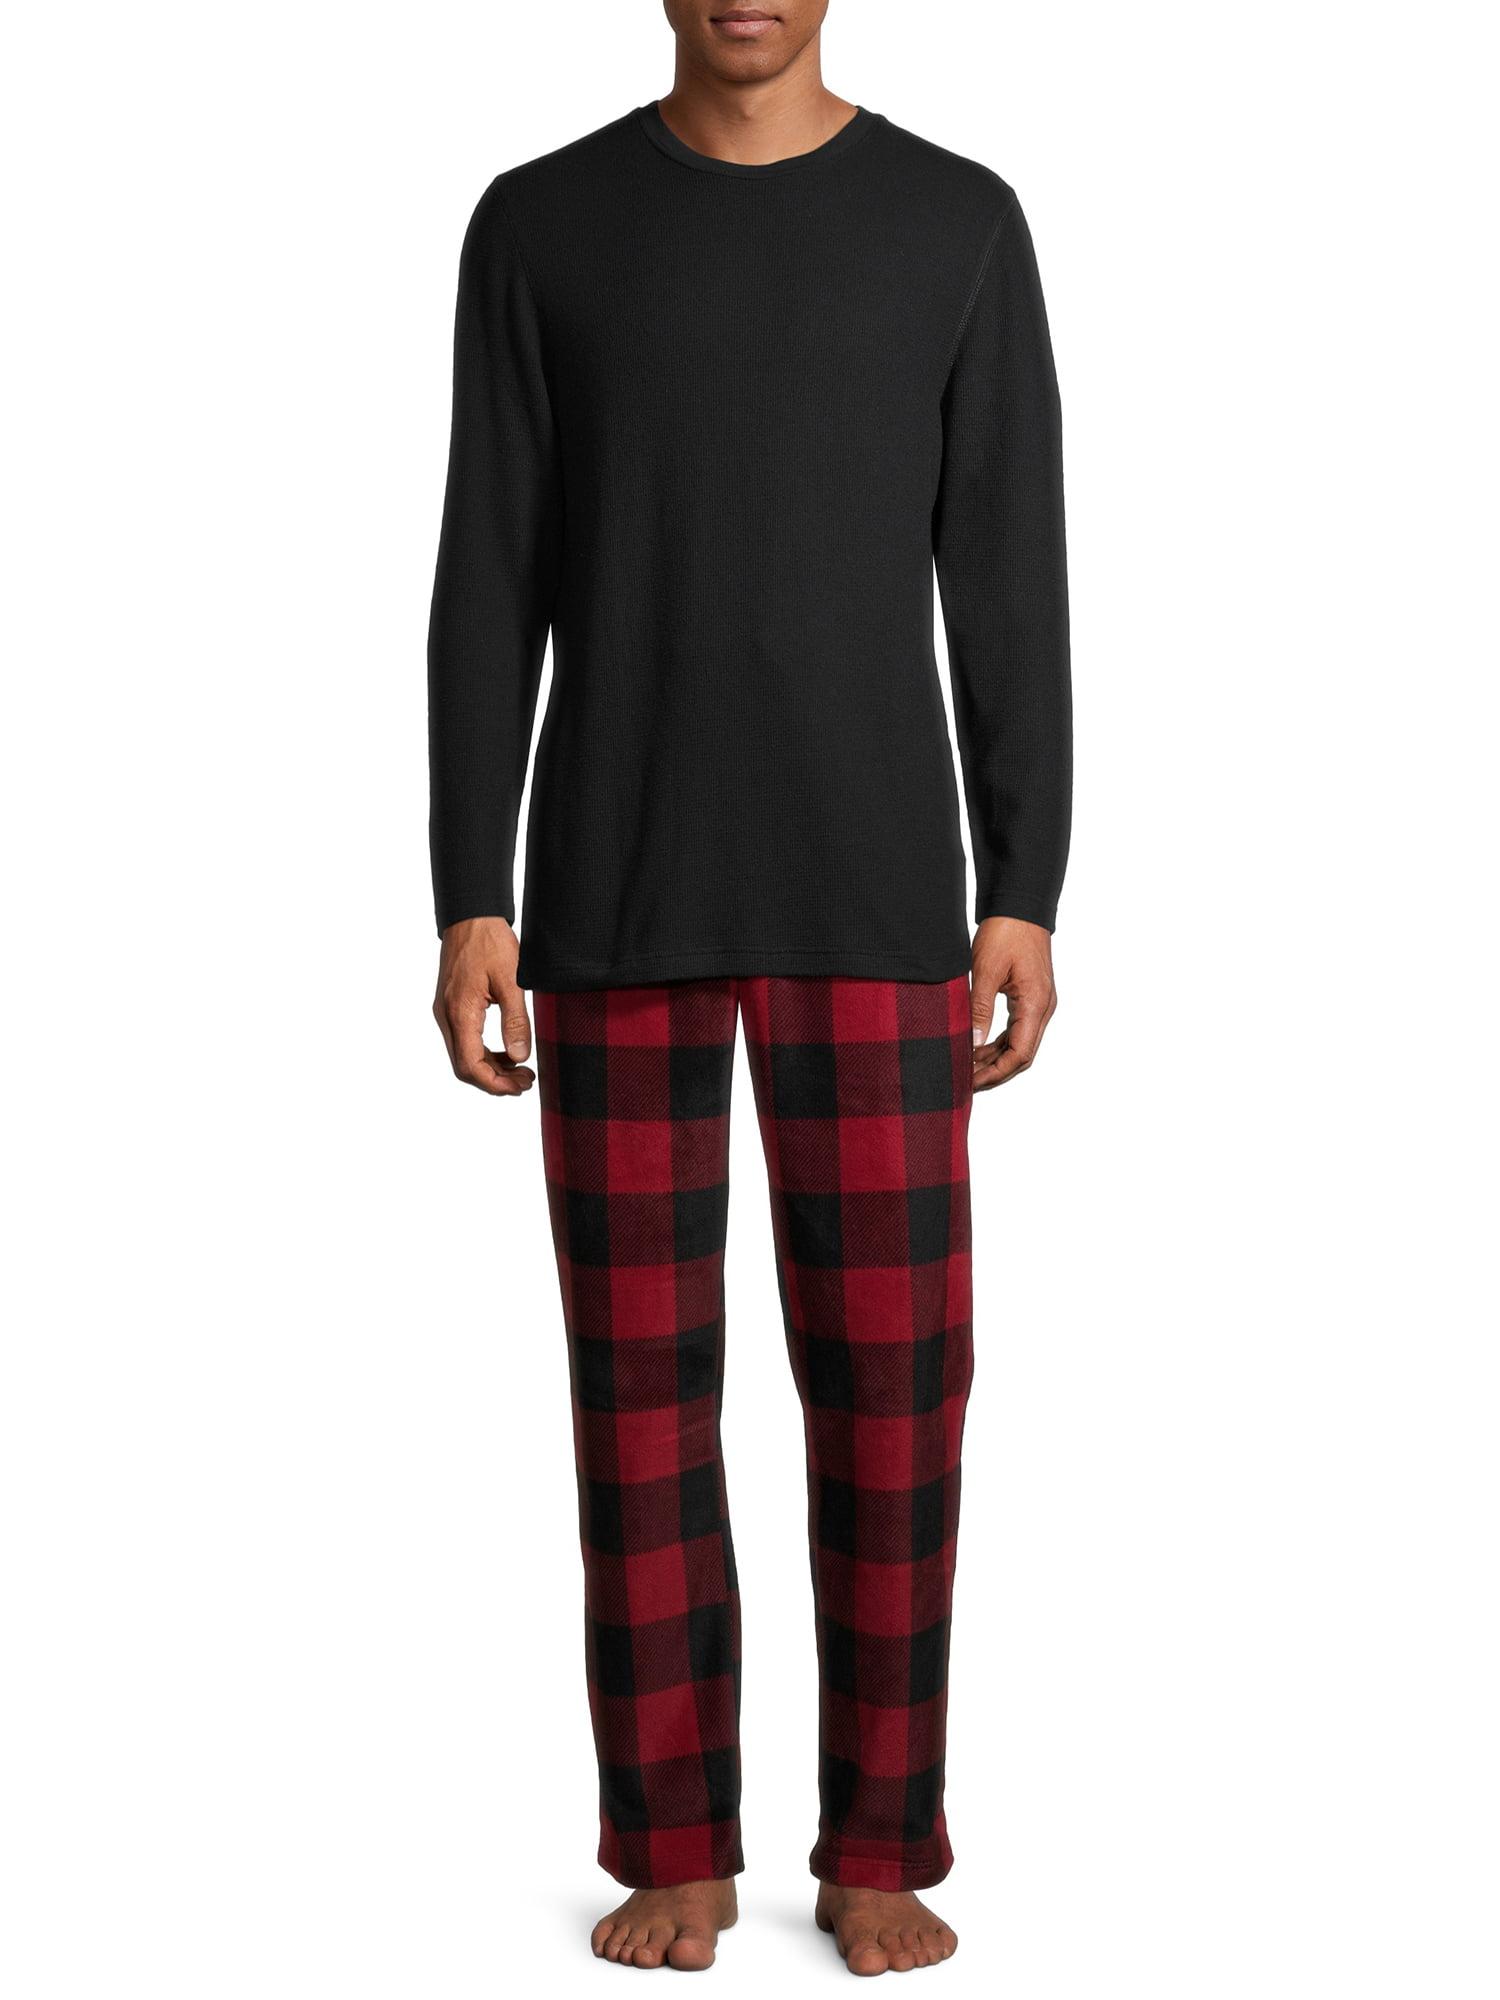 IZOD Mens Waffle Knit Long Sleeve Pajama Top